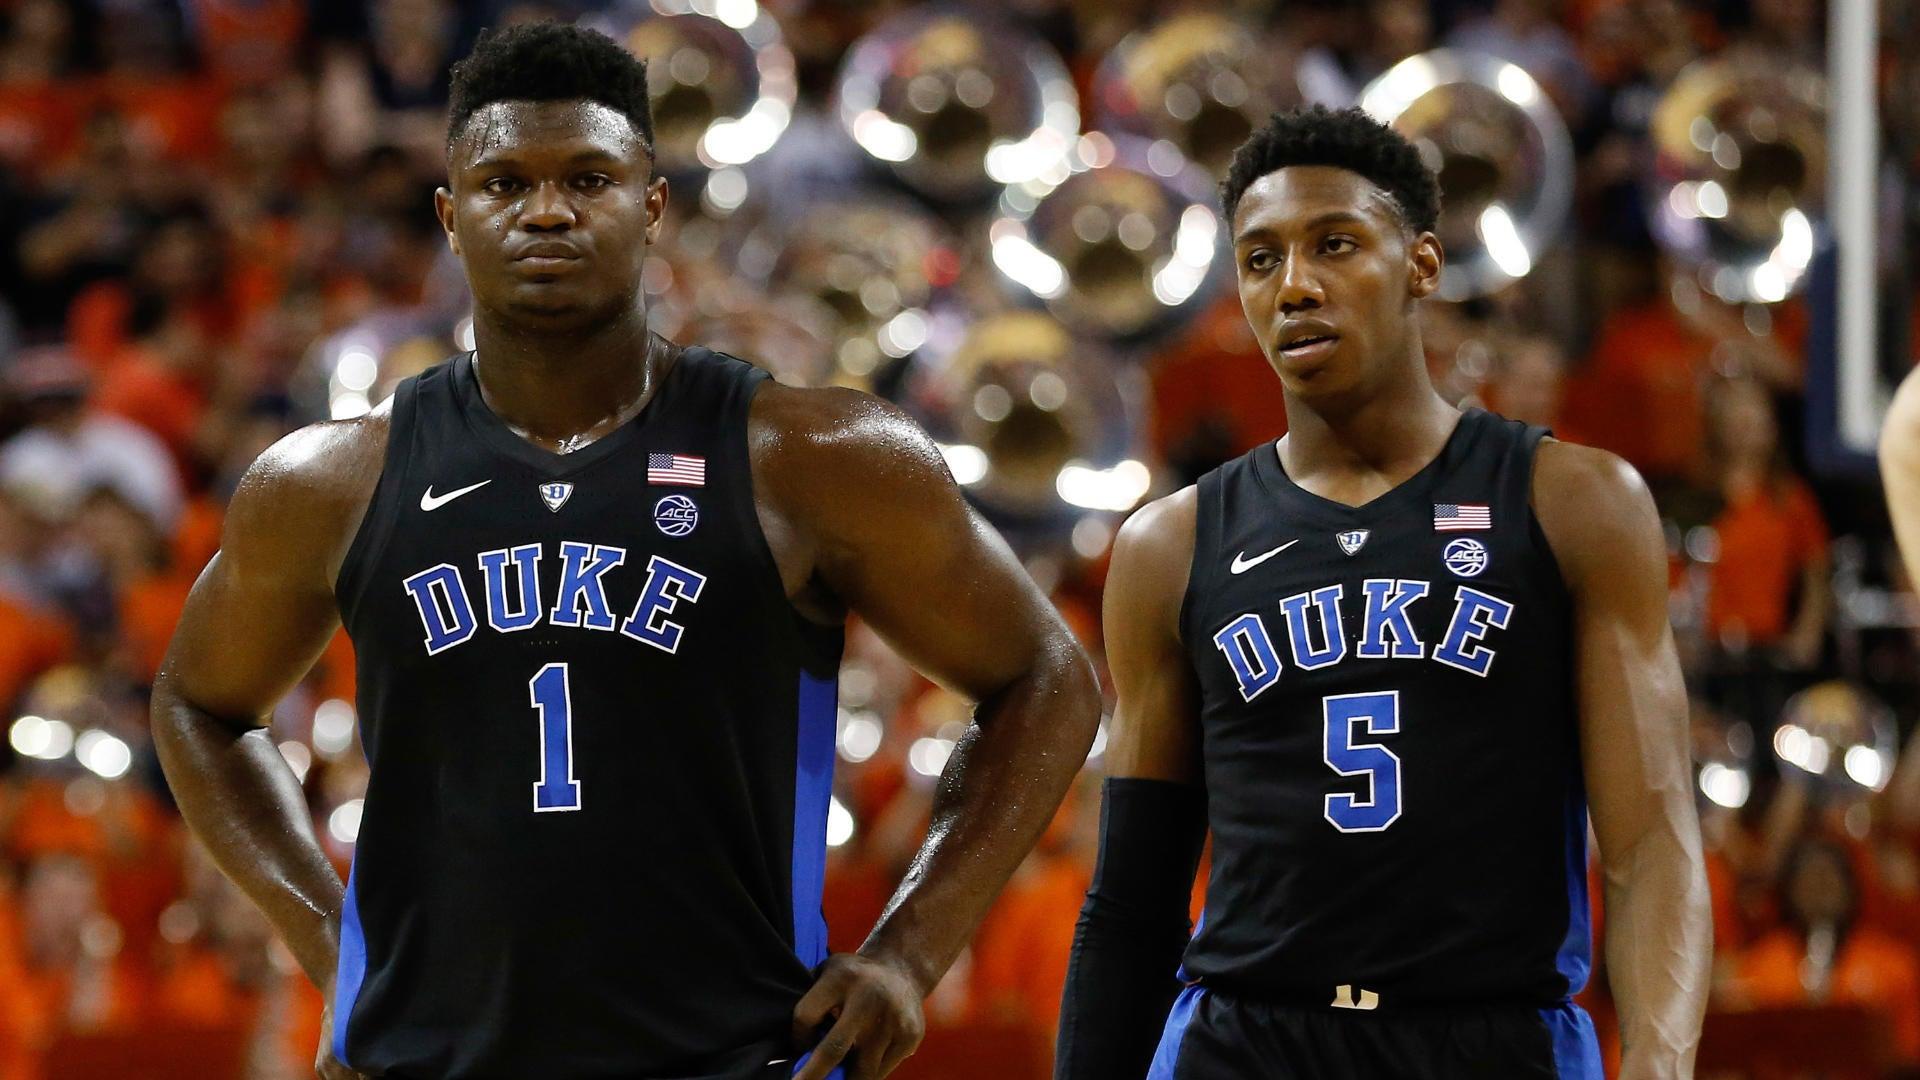 Duke vs. UNC: Former President Barack Obama expected to take in the Blue Devils vs. Tar Heels game